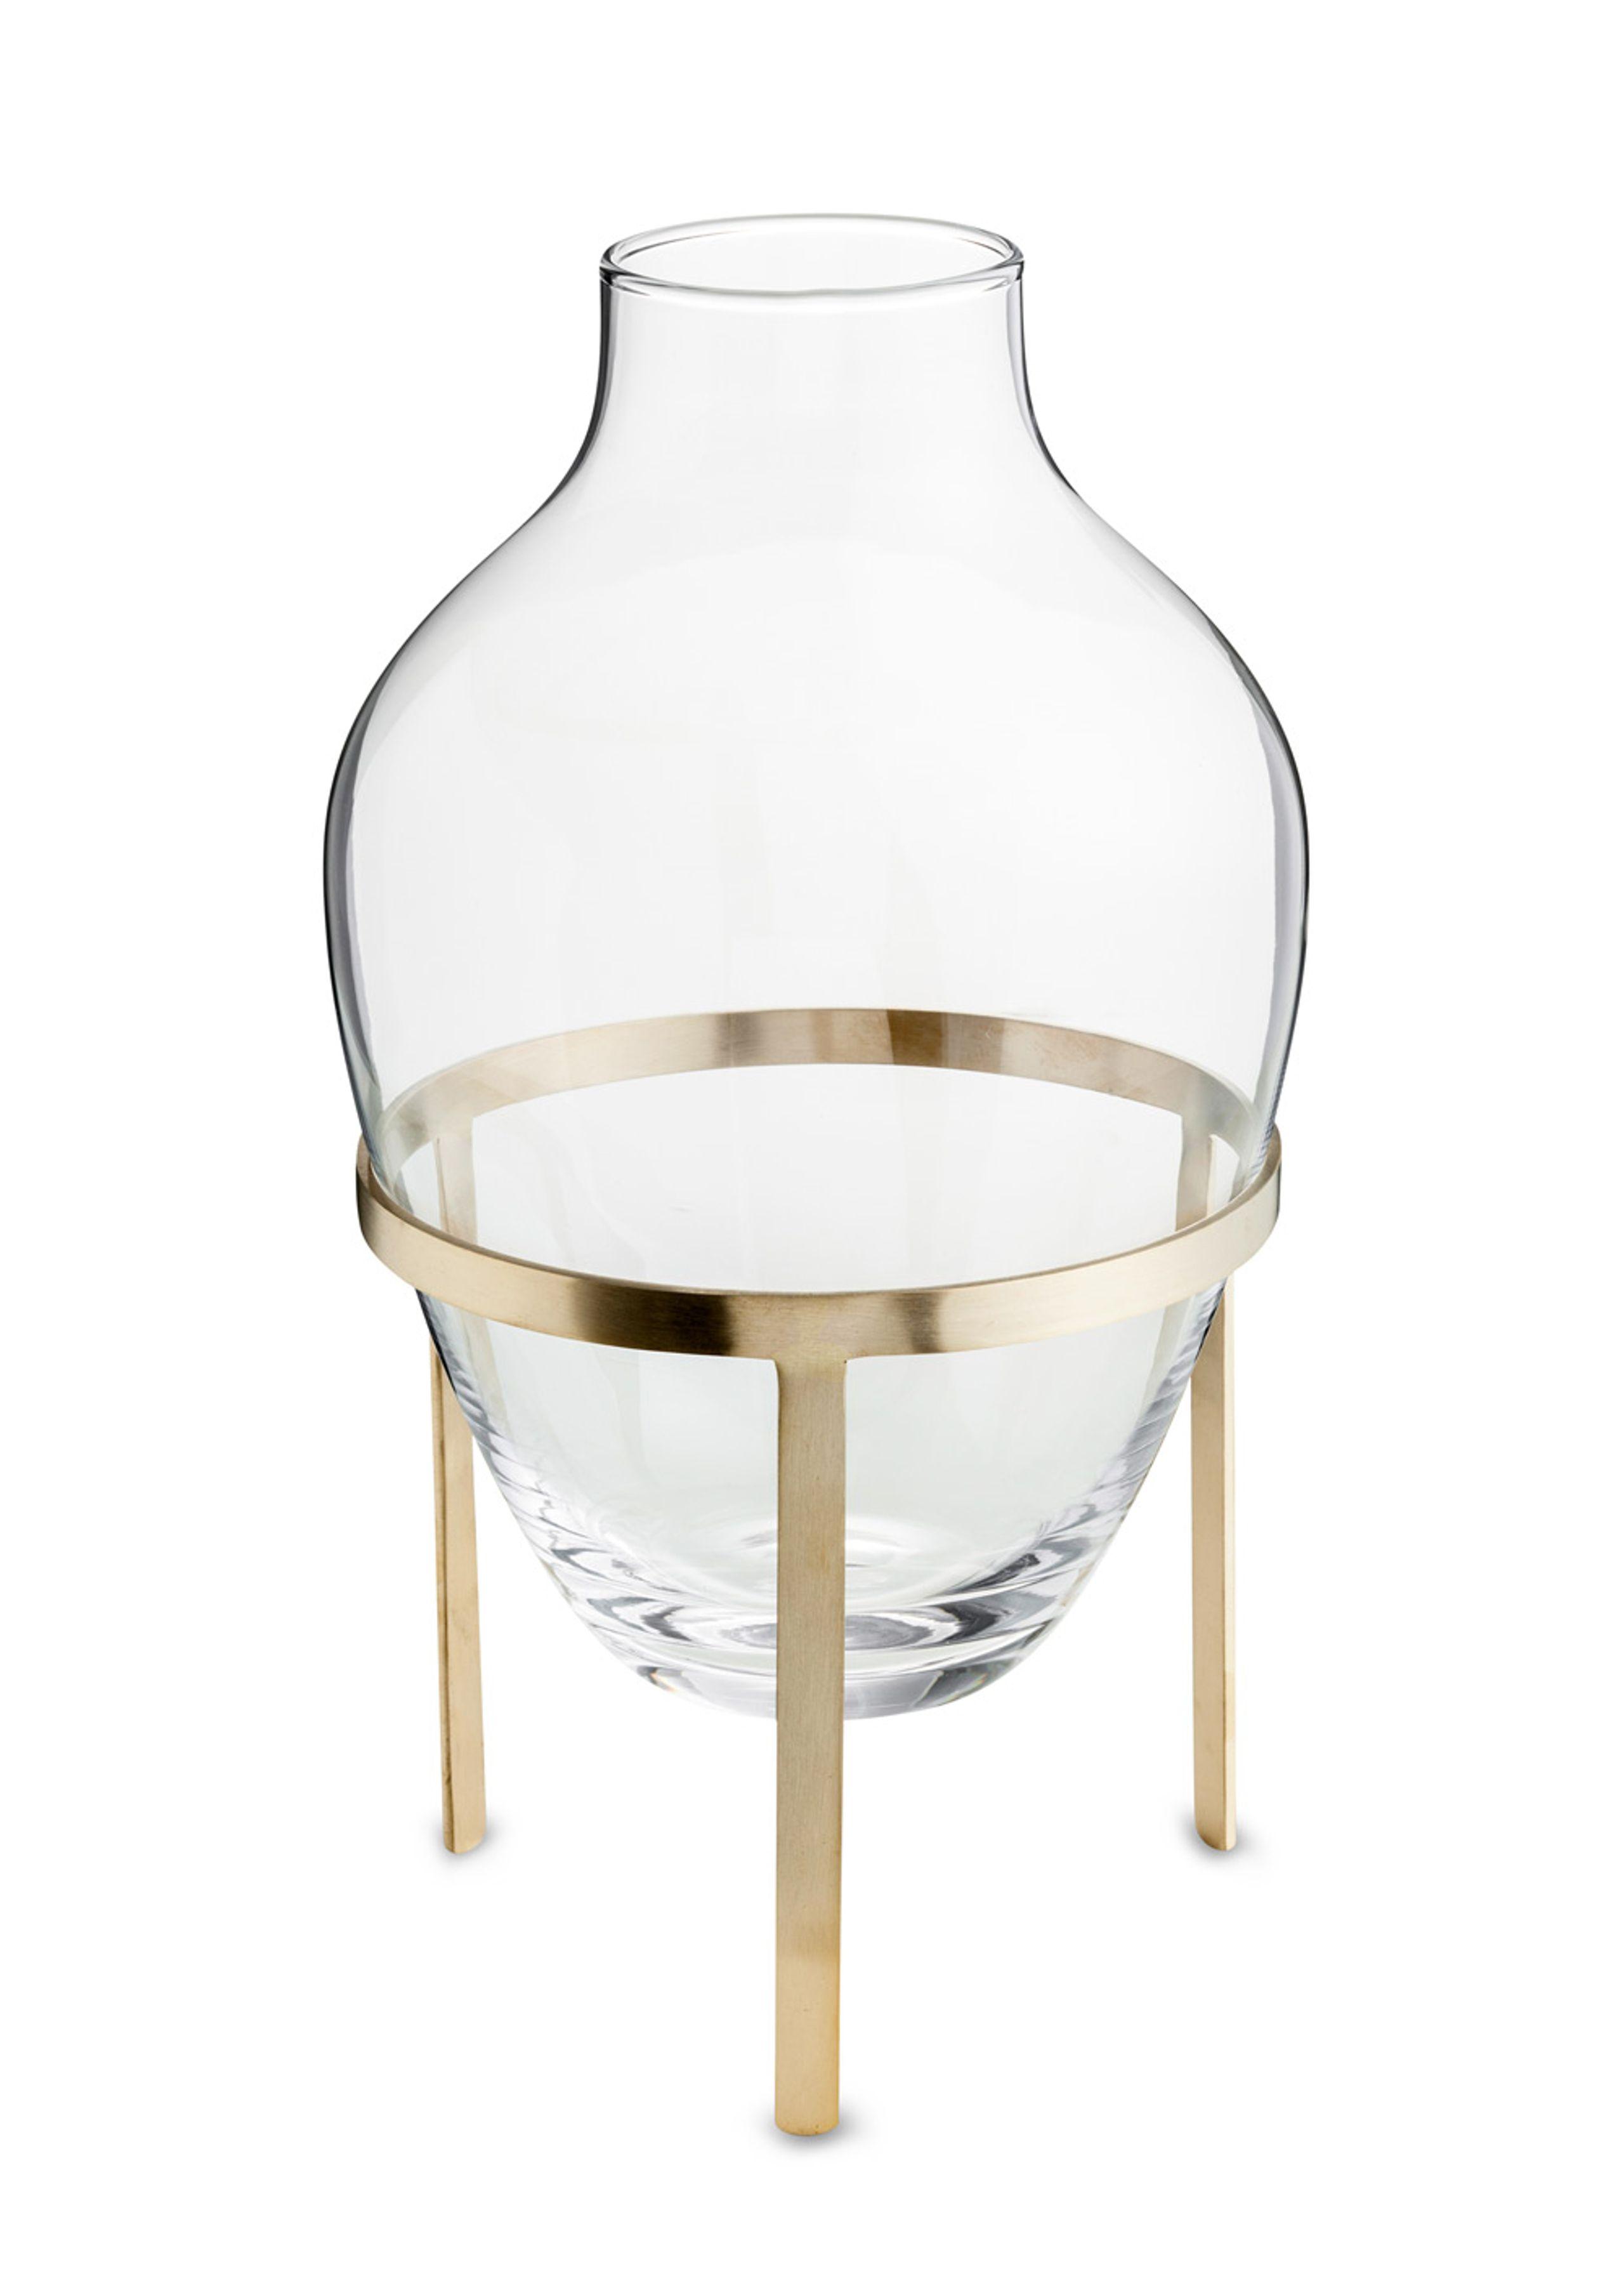 Glass vase w. stand